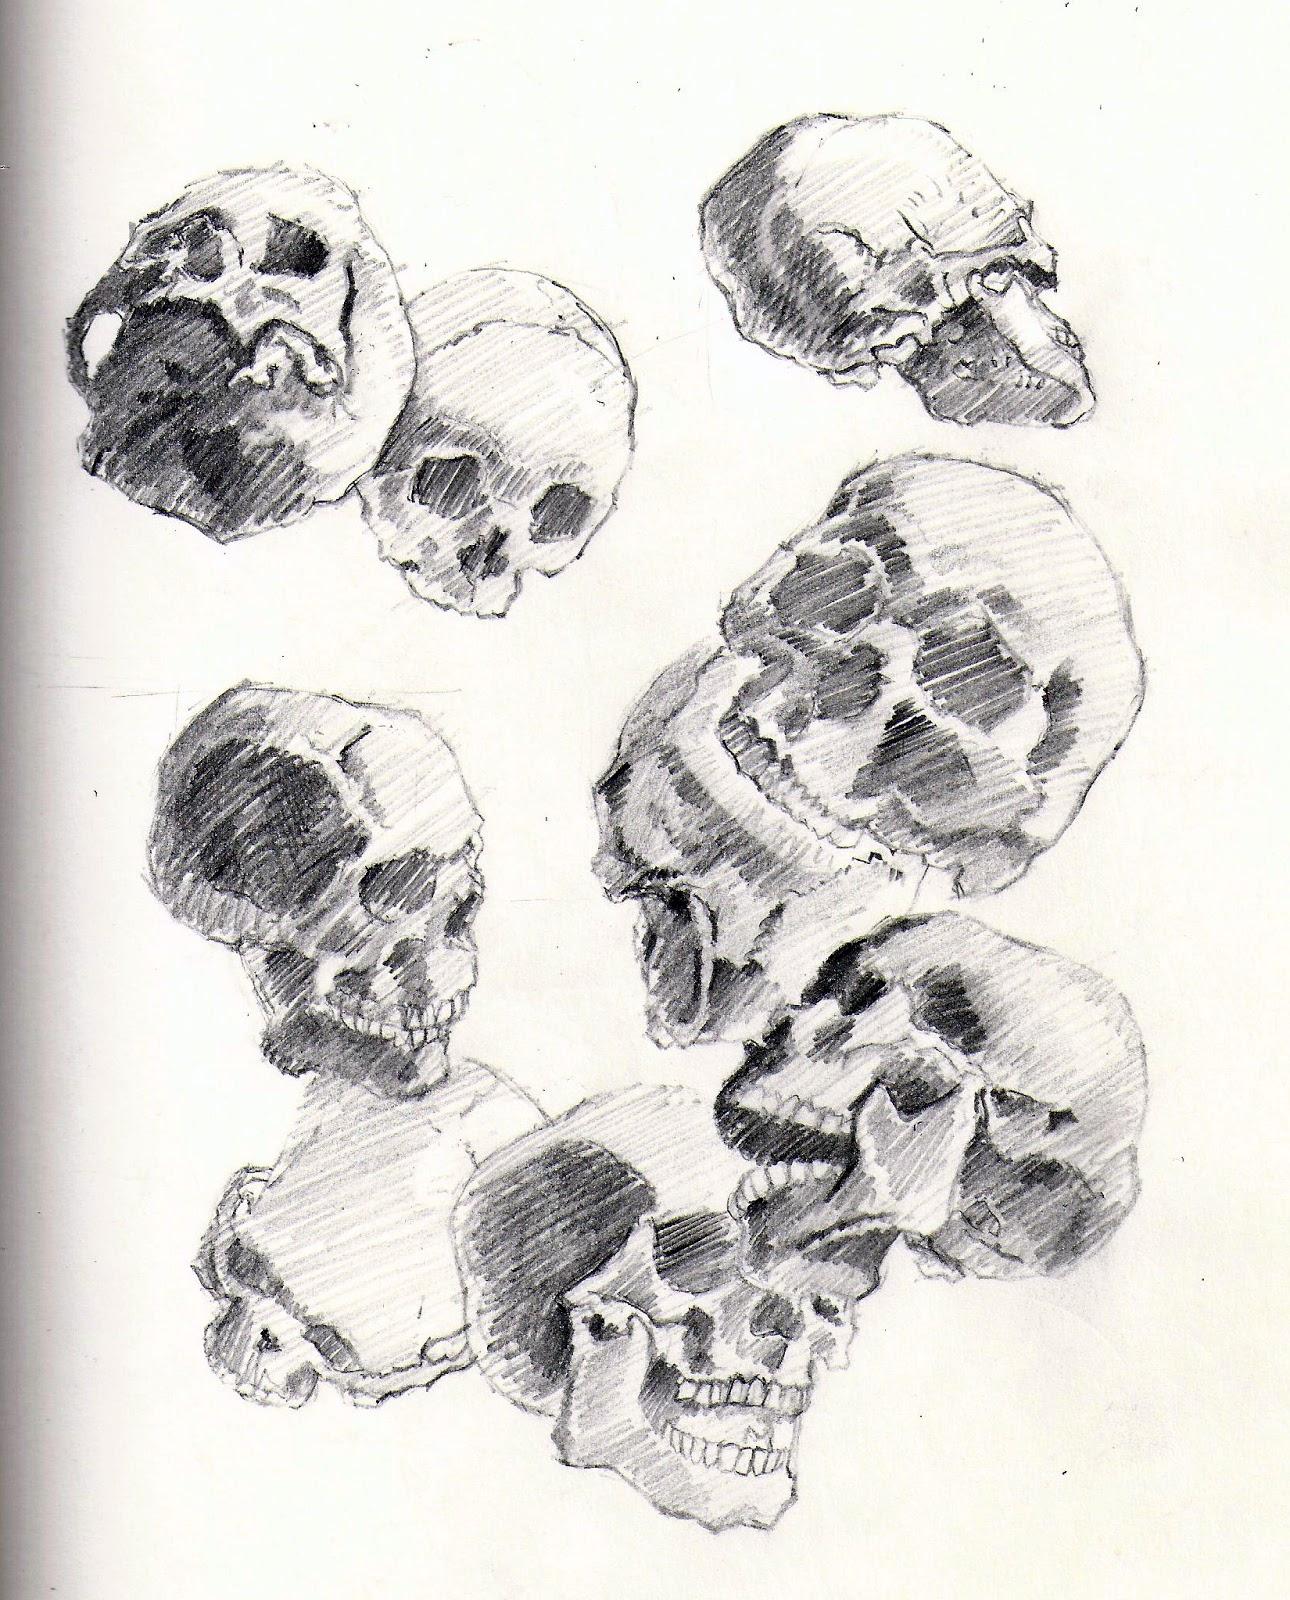 Jays Illustration Skulls From Atlas Of Human Anatomy For The Artist